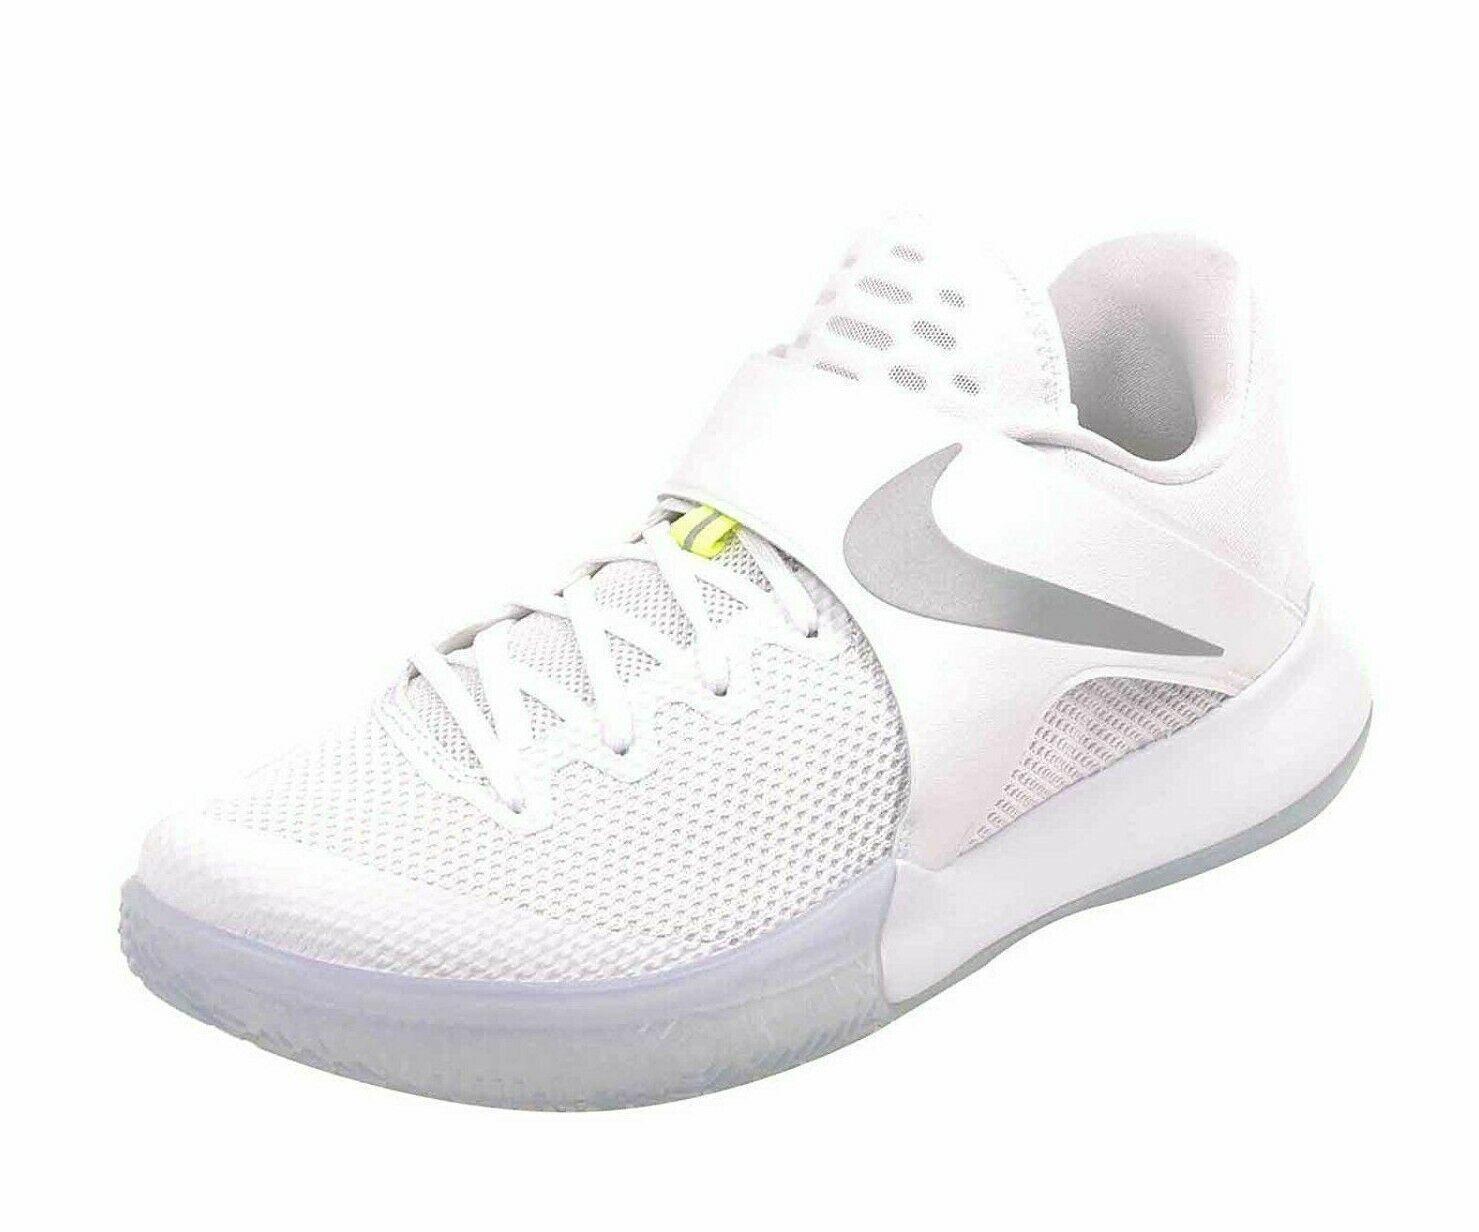 Nike Mens Mens Mens Zoom Live Sneakers 852421 117 White